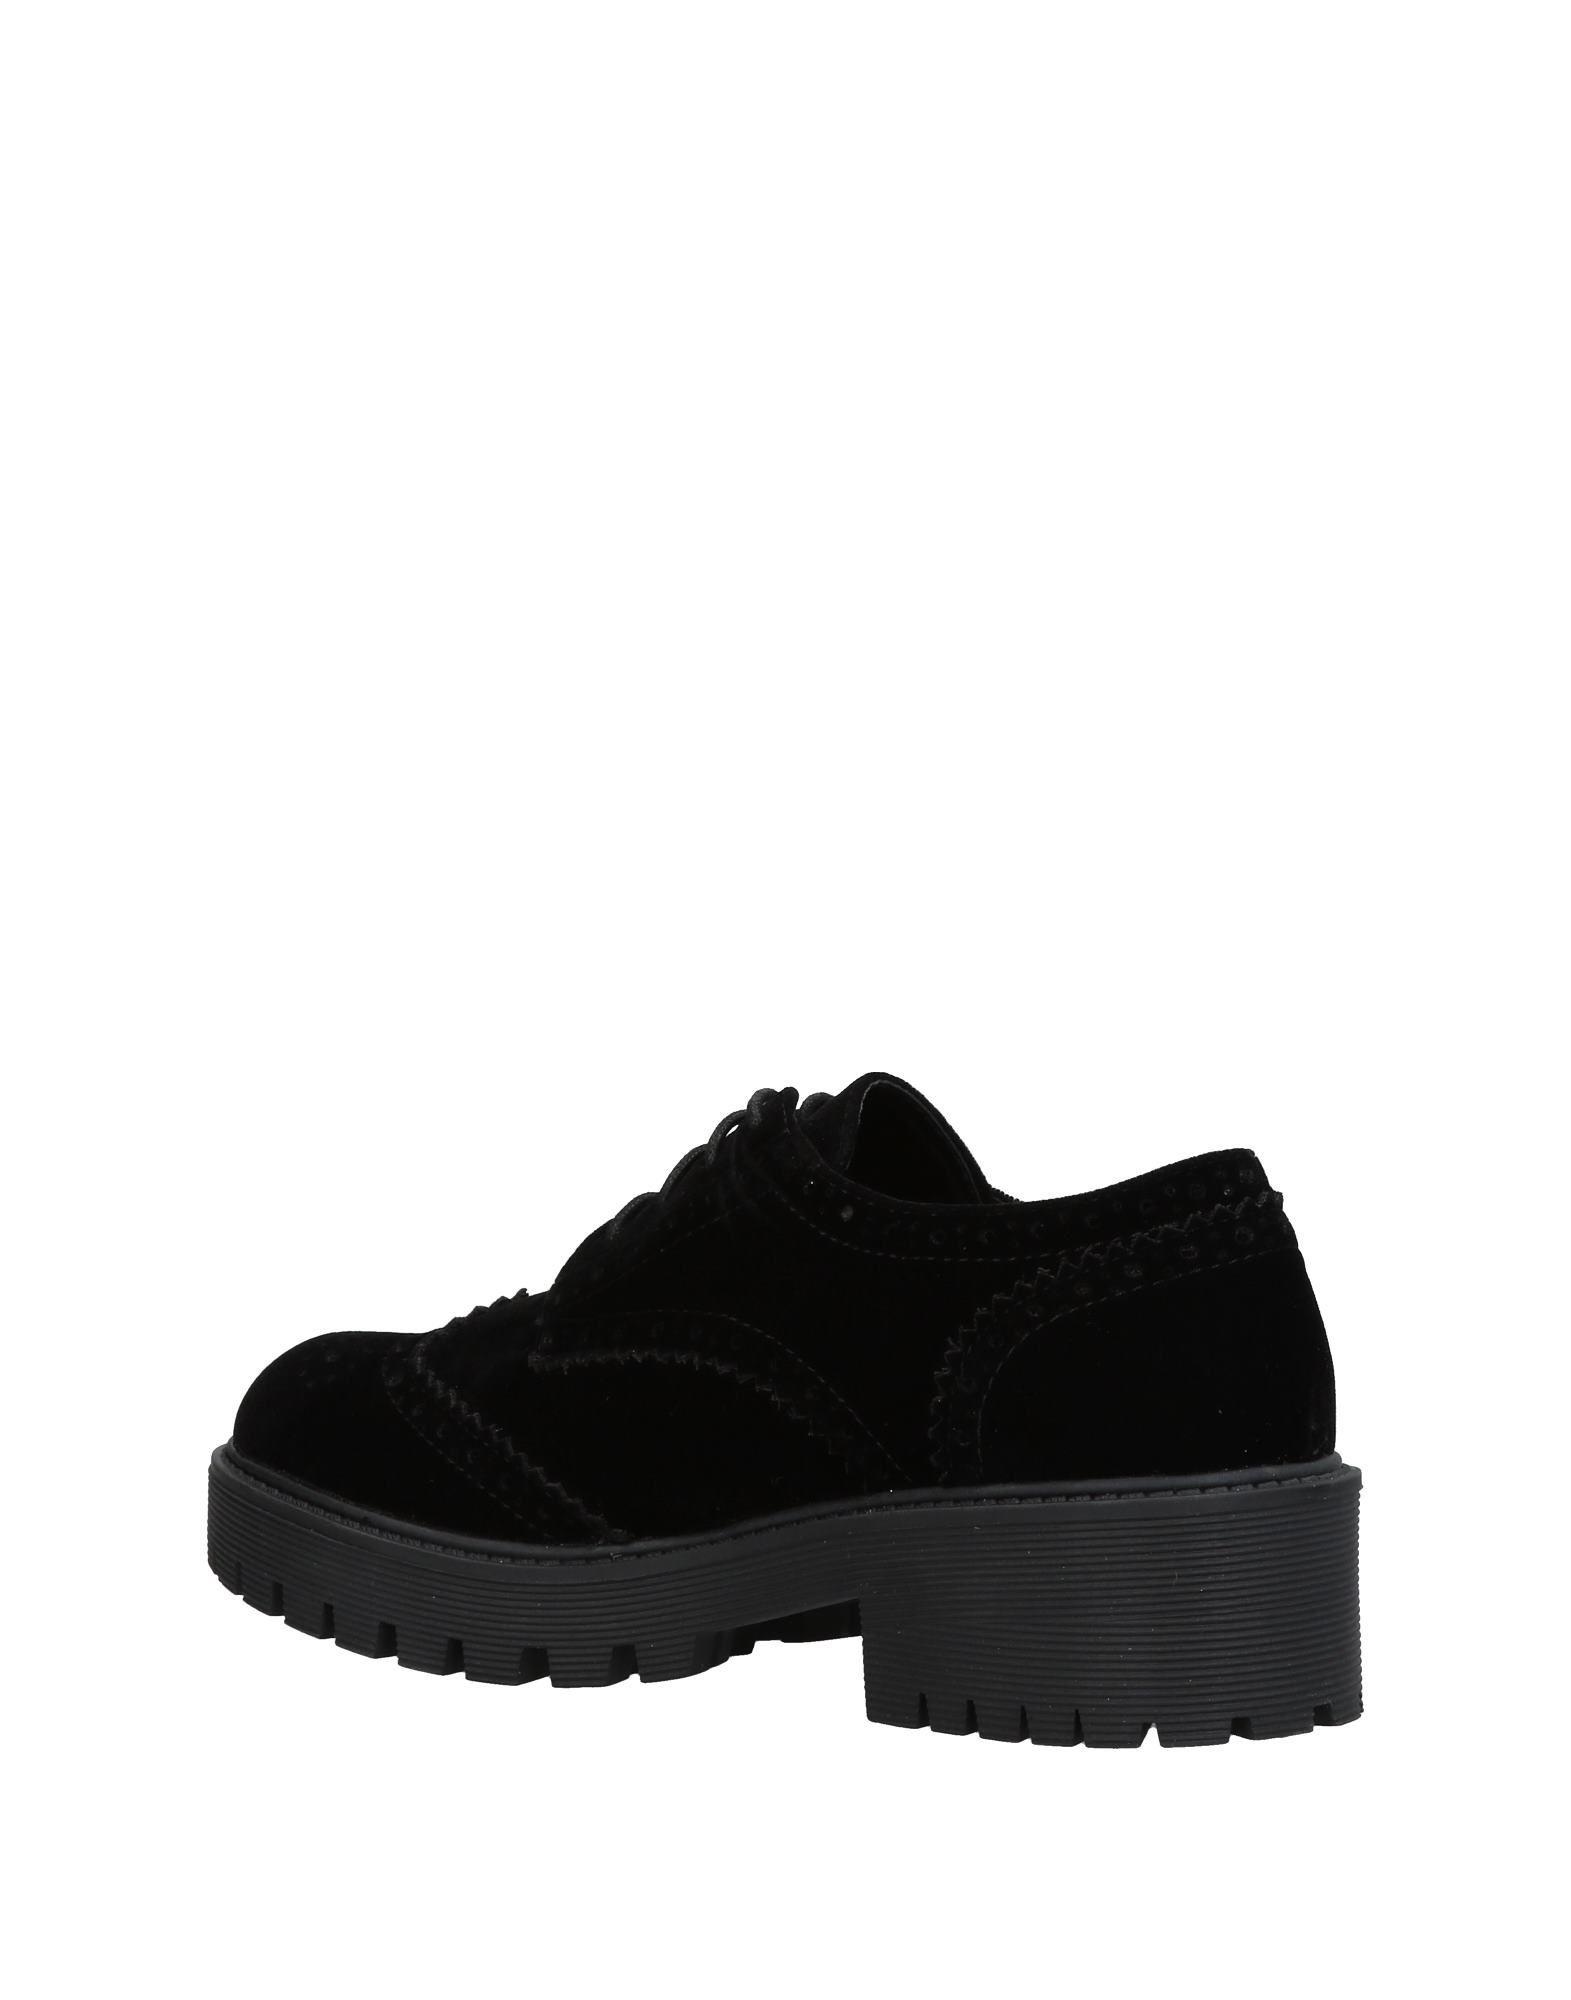 Tua By Braccialini Gute Schnürschuhe Damen  11448761LD Gute Braccialini Qualität beliebte Schuhe 7da196